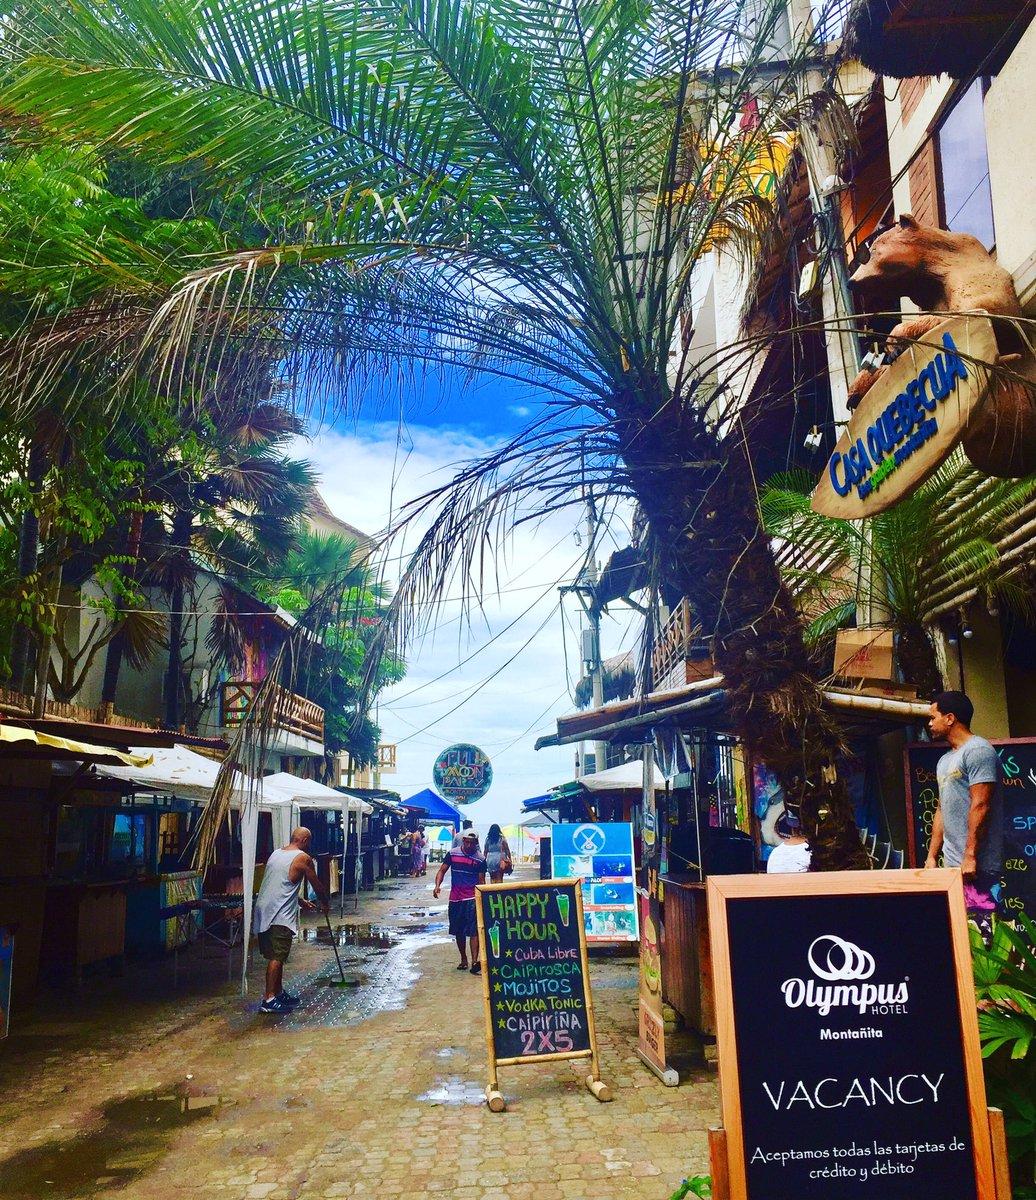 Montanita beach #beach #montañita #ecuador #travel #view #equador #pacific #ocean #praia #beachfront #beautiful #coast<br>http://pic.twitter.com/OLW3H0S6qF